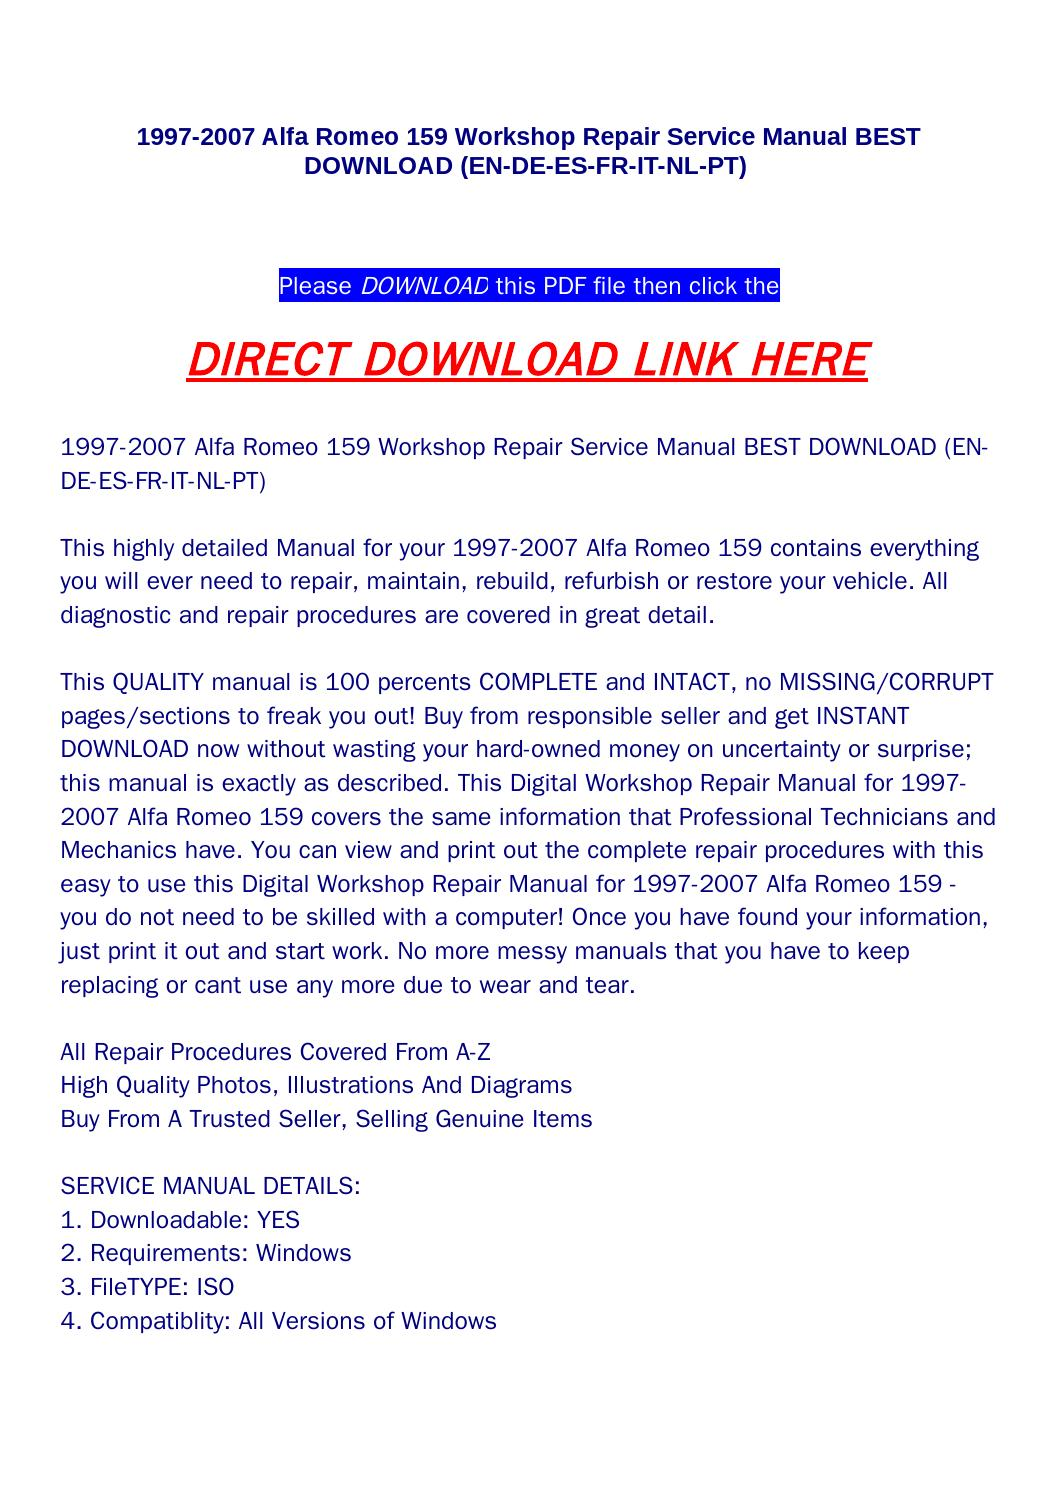 1997 2007 alfa romeo 159 workshop repair service manual best download (en  de es fr it nl pt) by aood - issuu